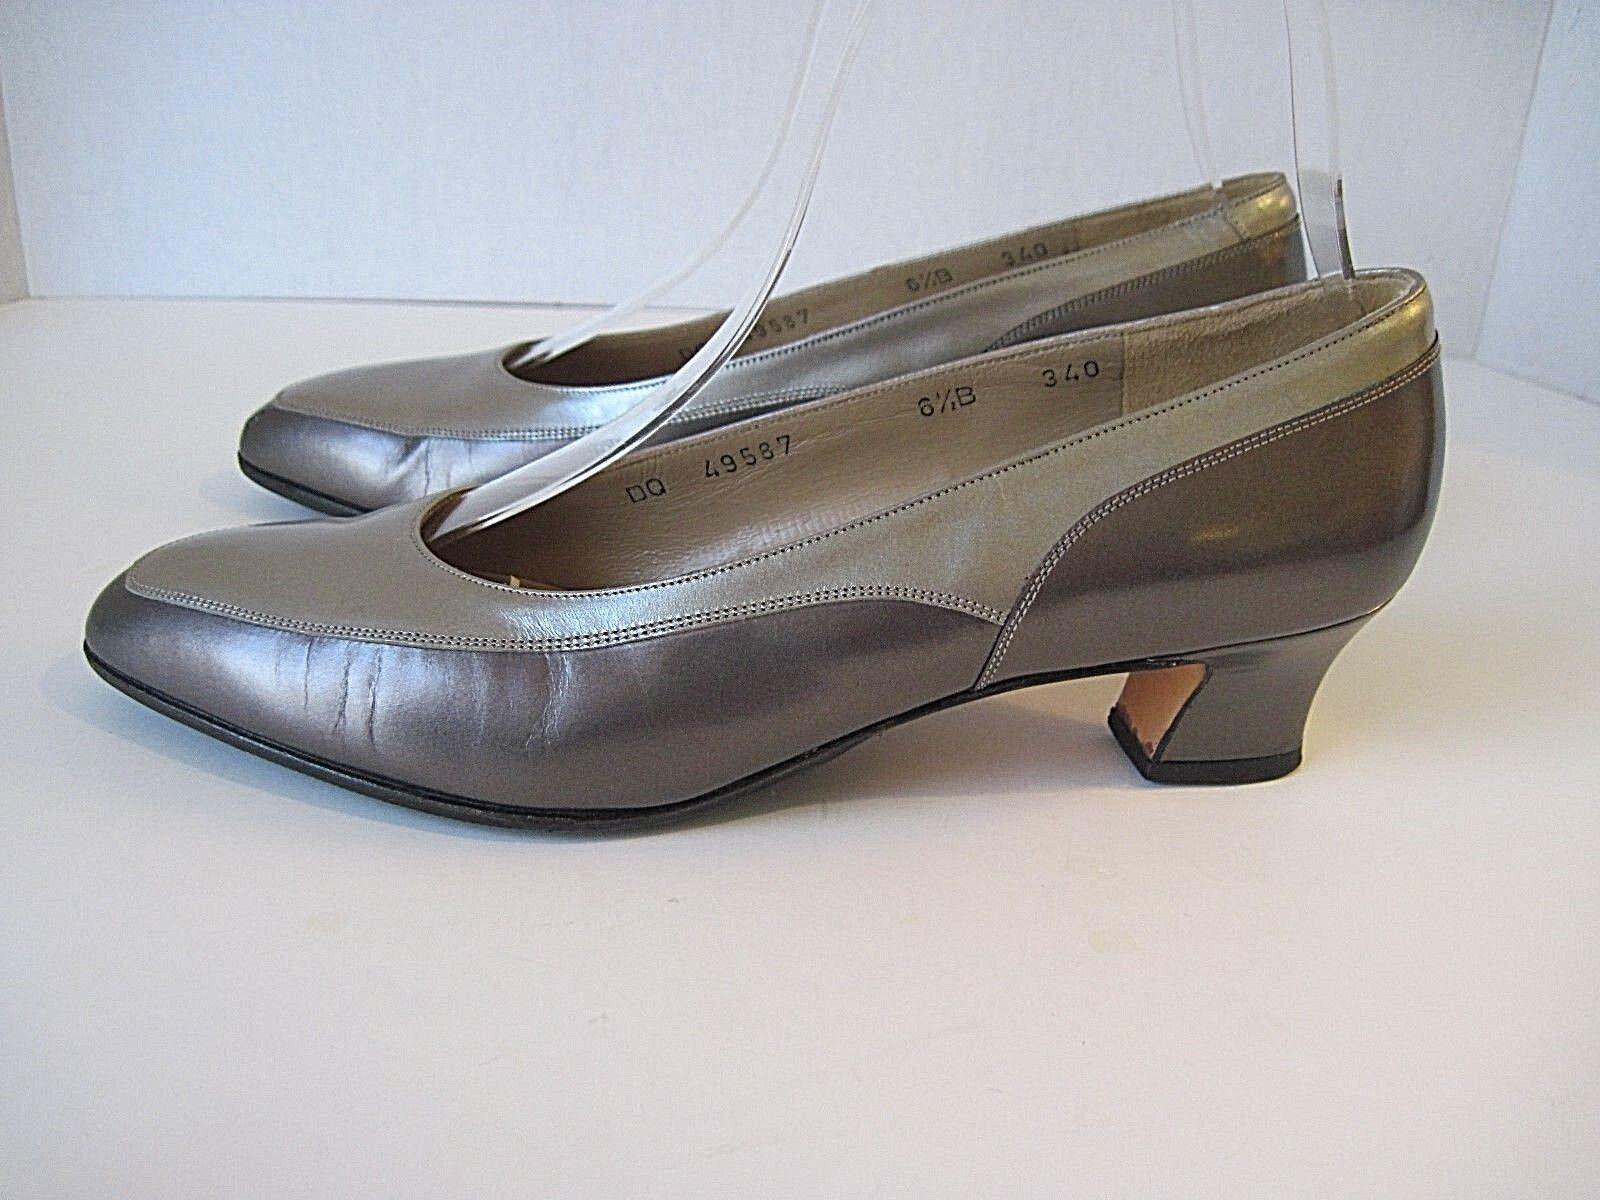 Salvatore Ferragamo B, Pewter Silver Leather Heels Size 6 1/2 B, Ferragamo Have Been Resoled 393aa9